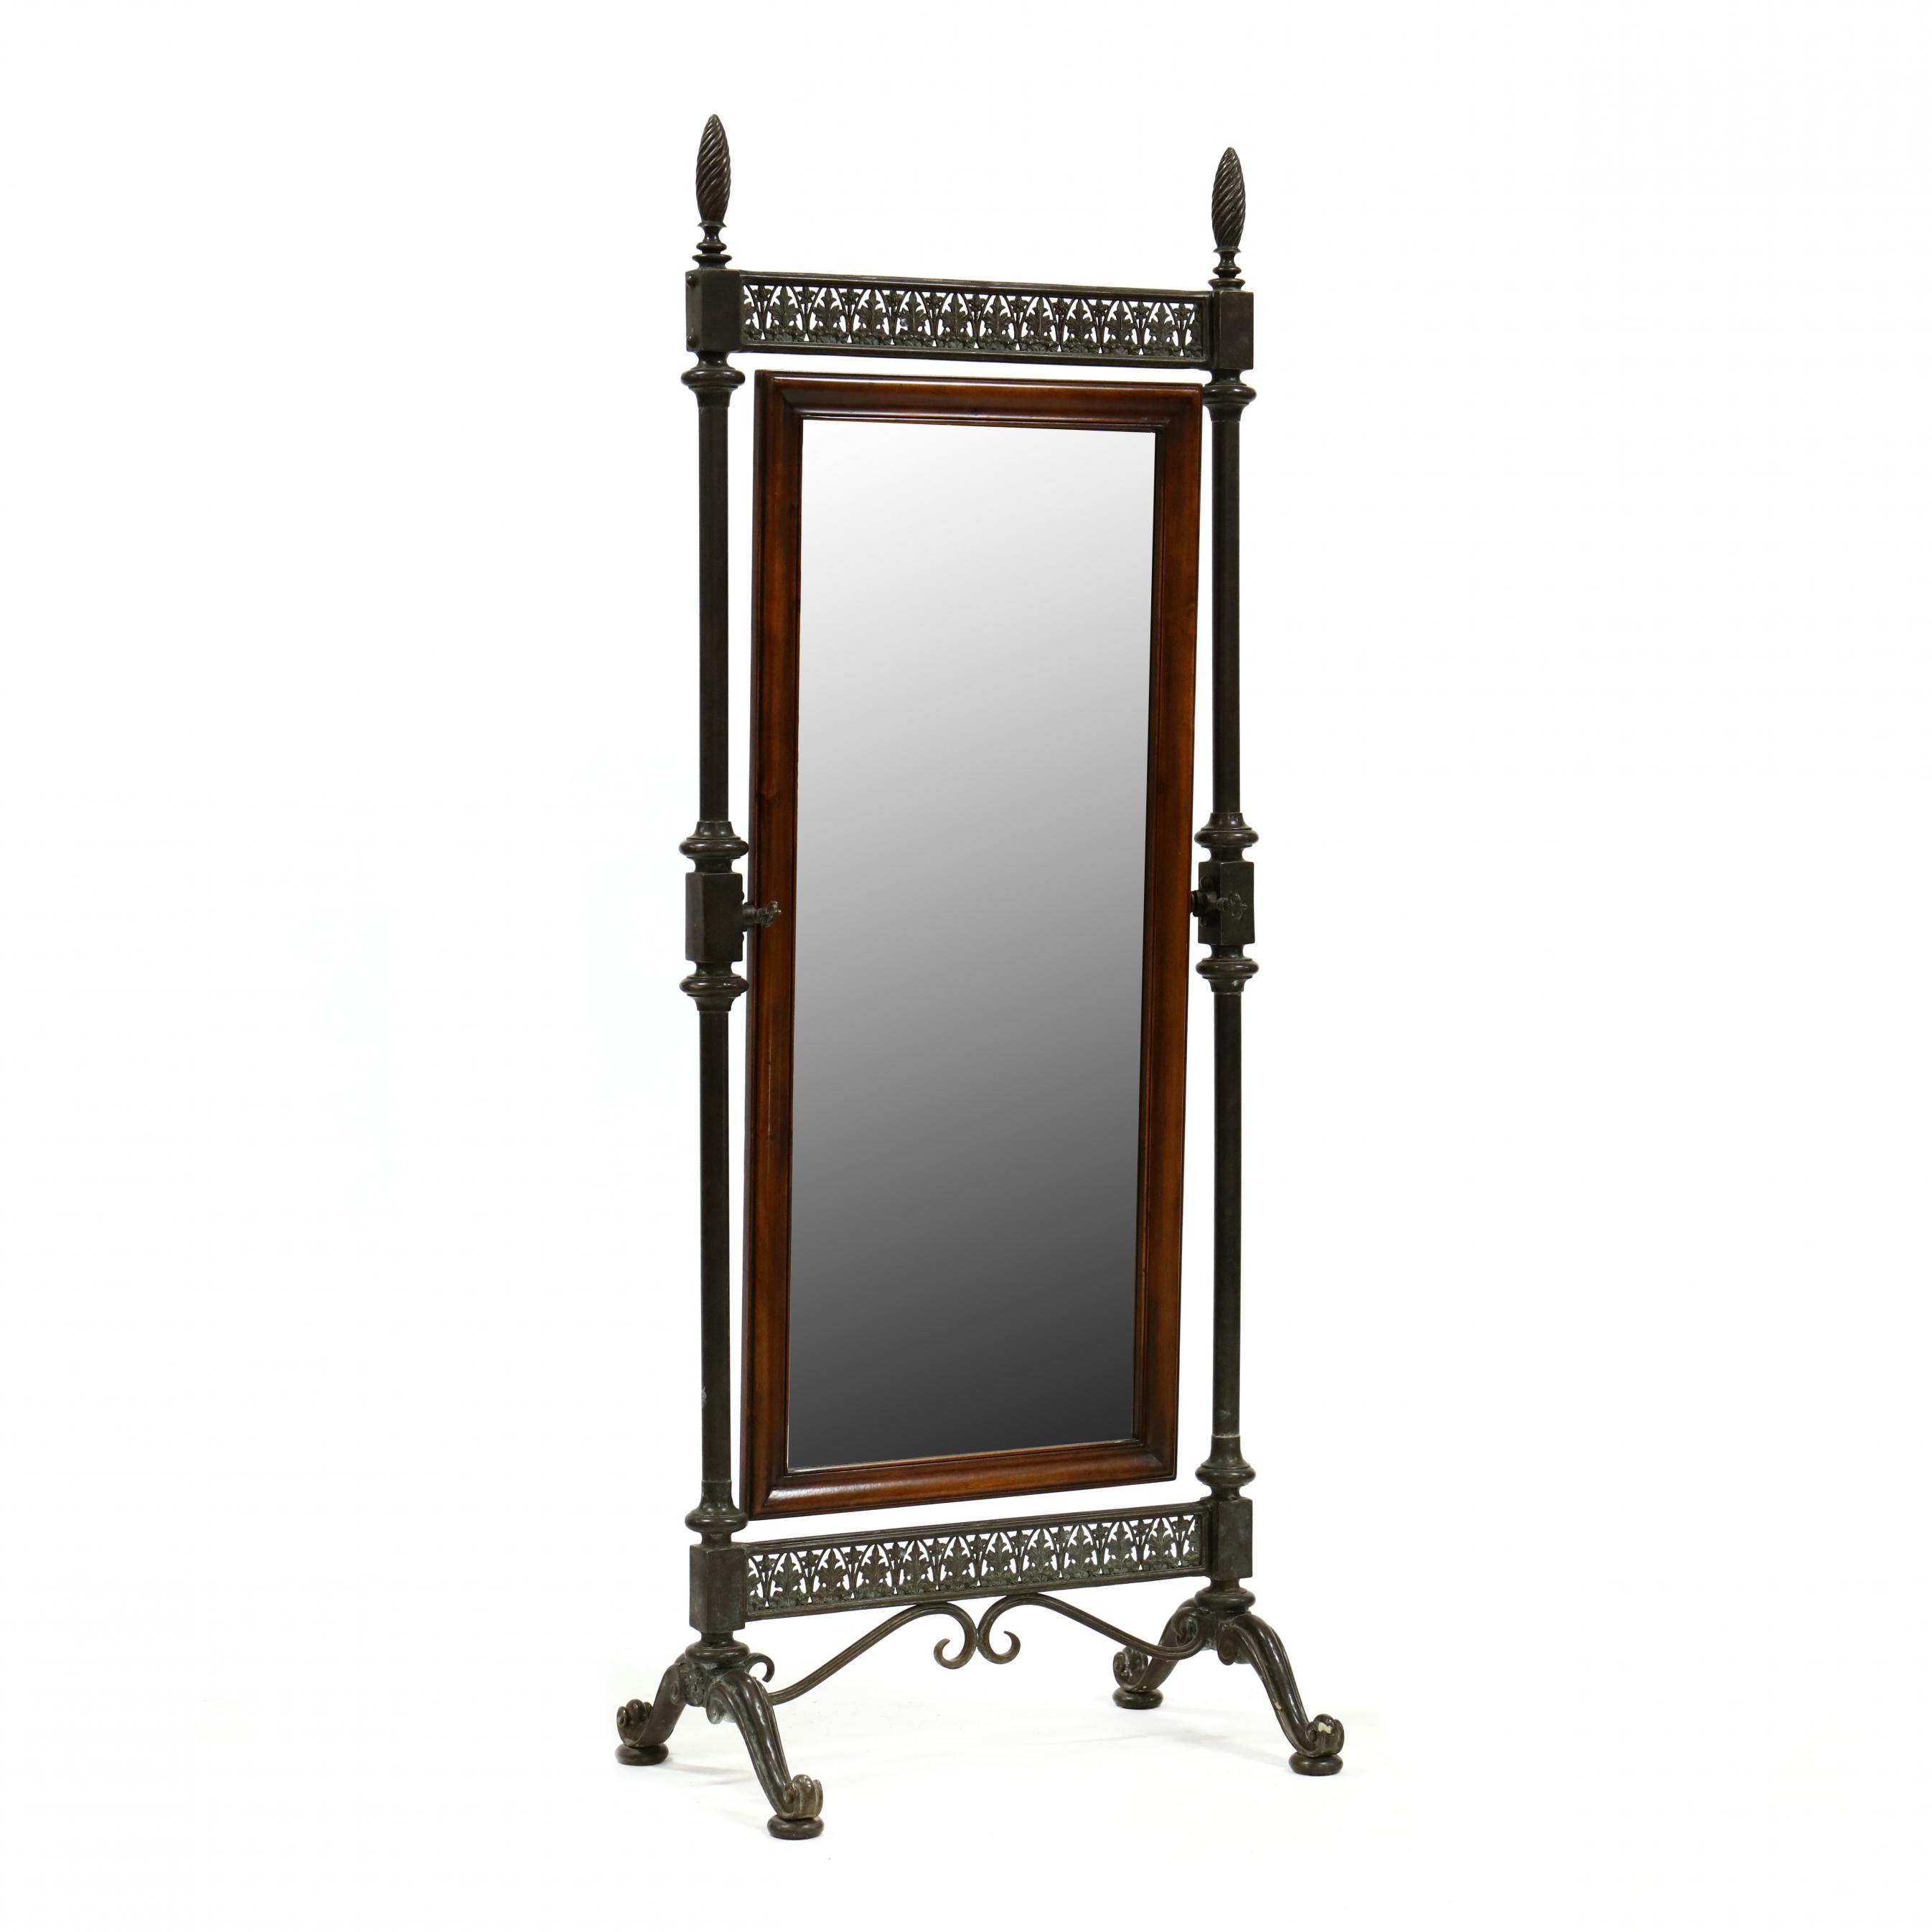 continental-bronze-and-mahogany-cheval-mirror